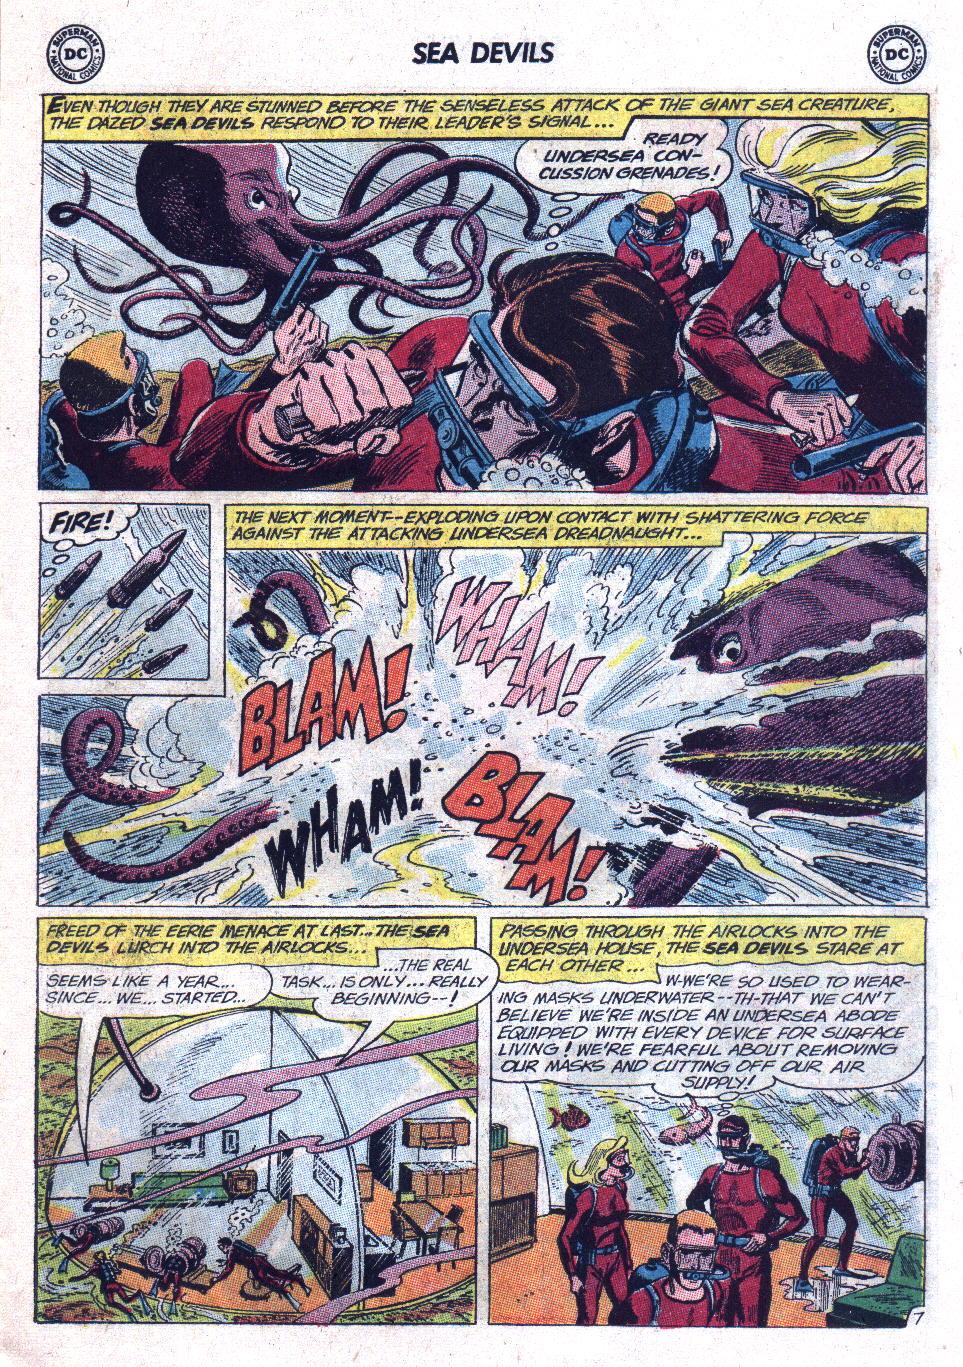 Read online Sea Devils comic -  Issue #11 - 11